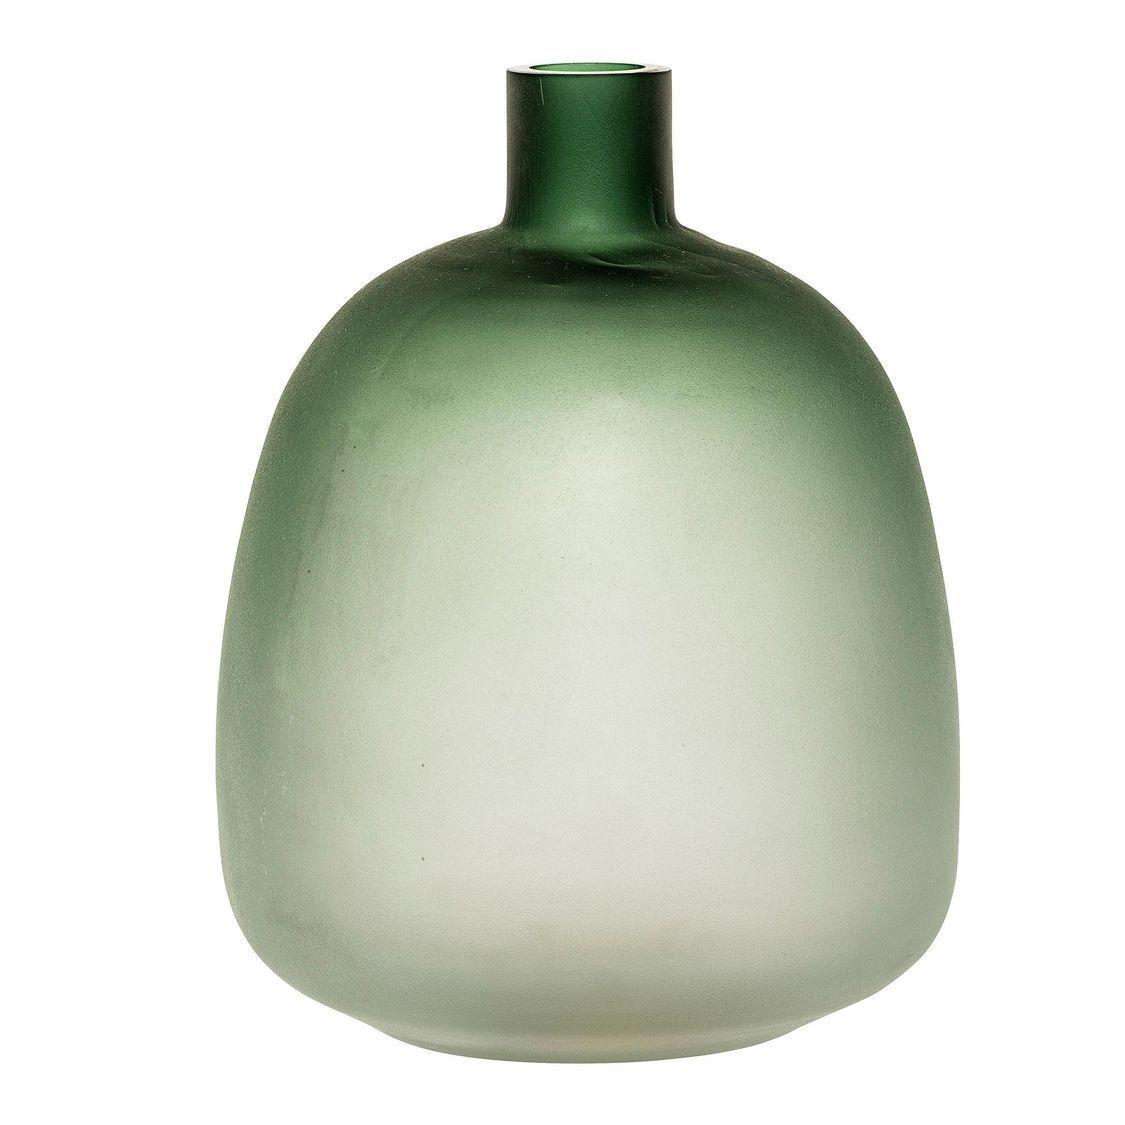 bloomingville glass vase bloomingville. Black Bedroom Furniture Sets. Home Design Ideas